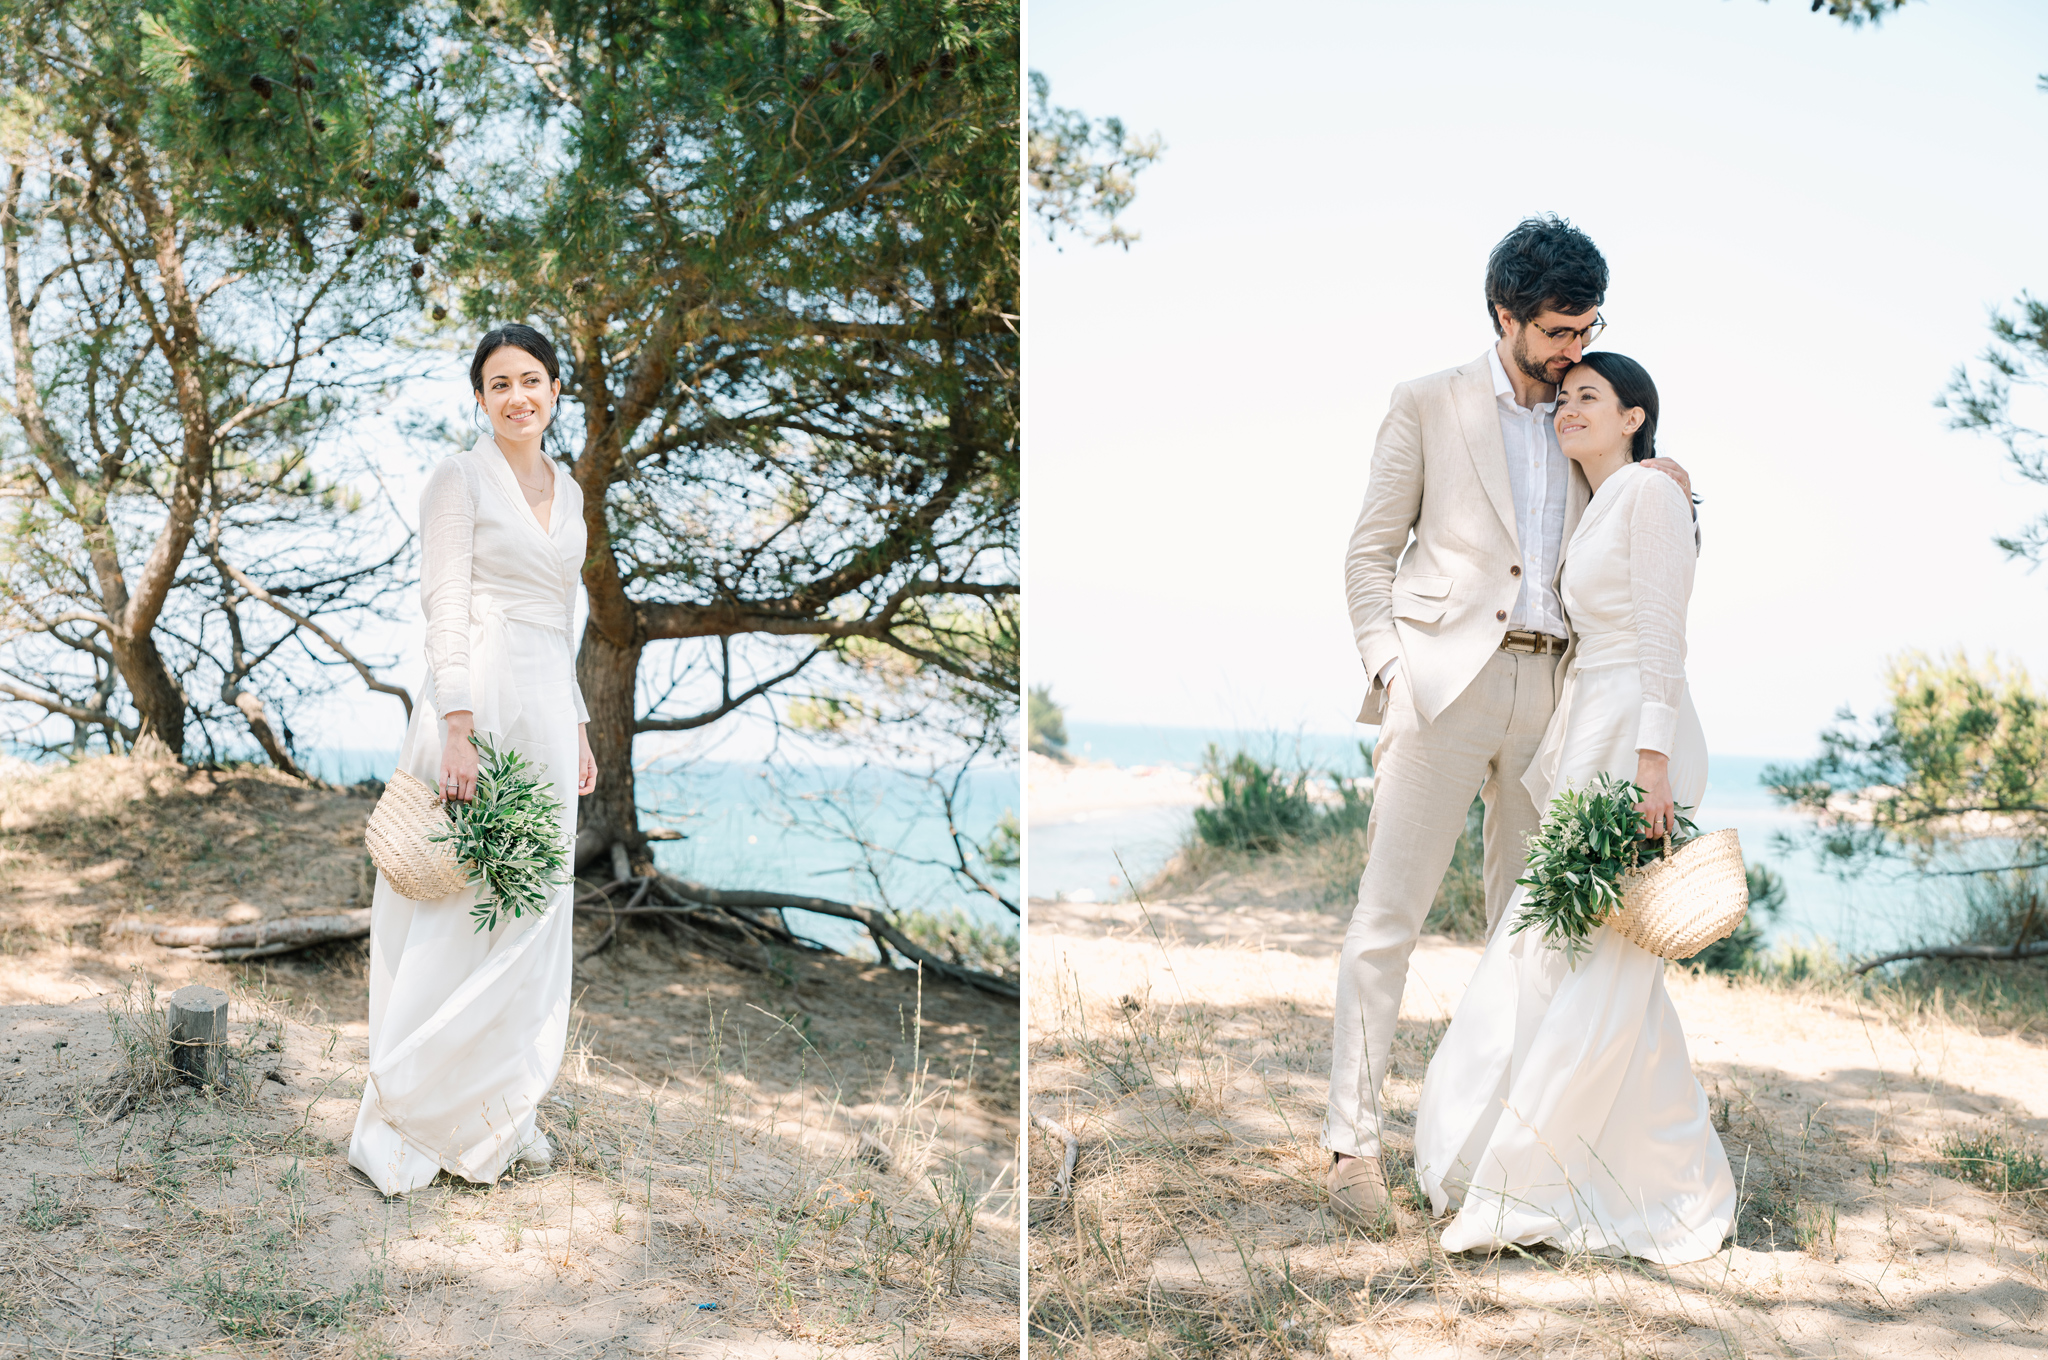 fotografia-boda-mediterraneo053.jpg